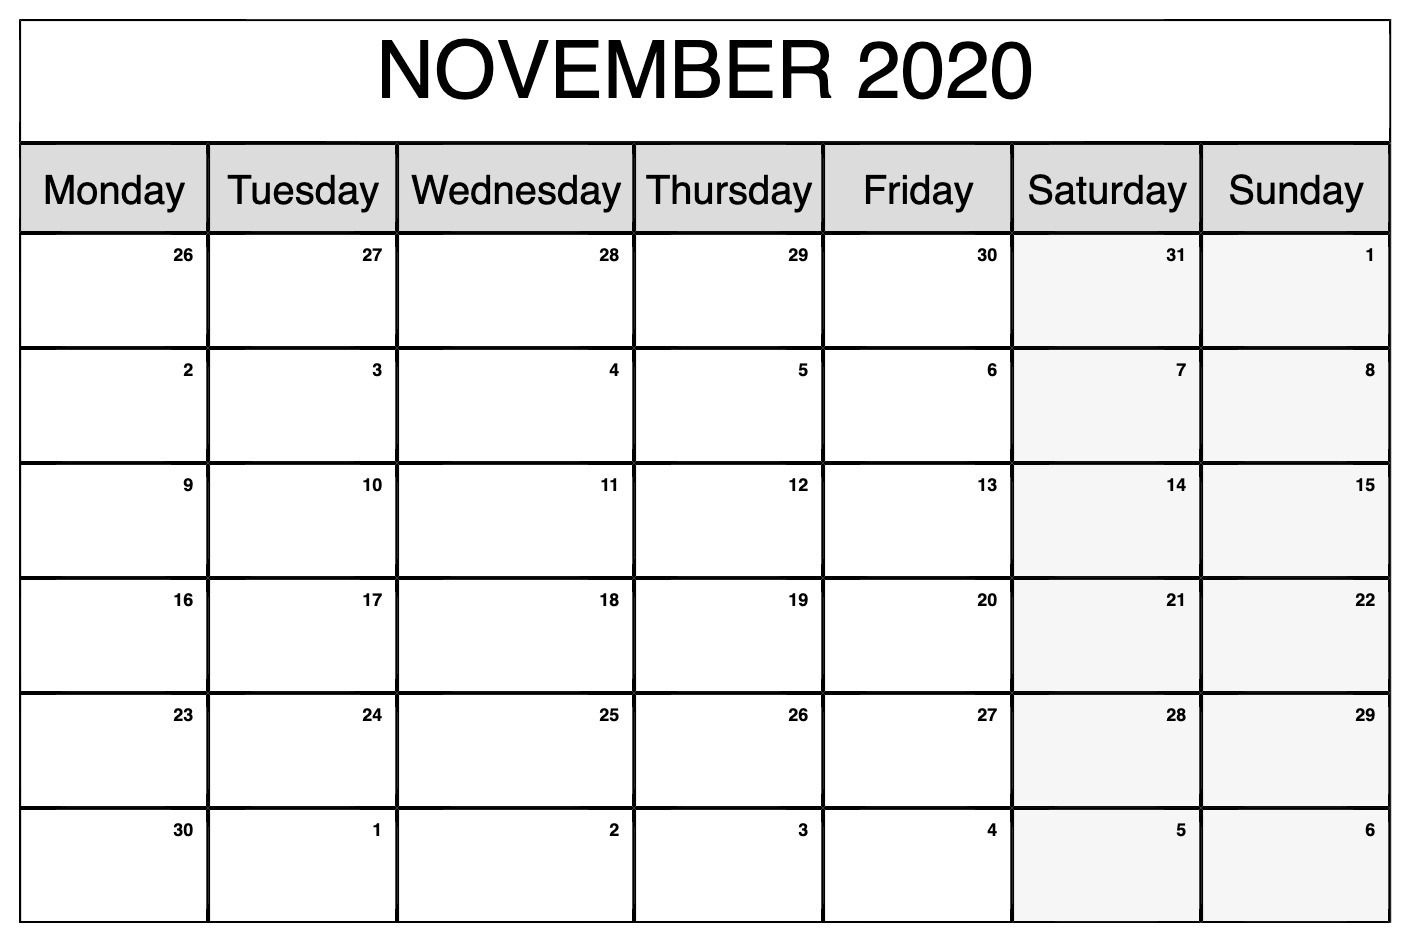 Calendar Monthly November 2020 | Calendar Ideas Design Creative within November 2020 Calendar Beta Calendars